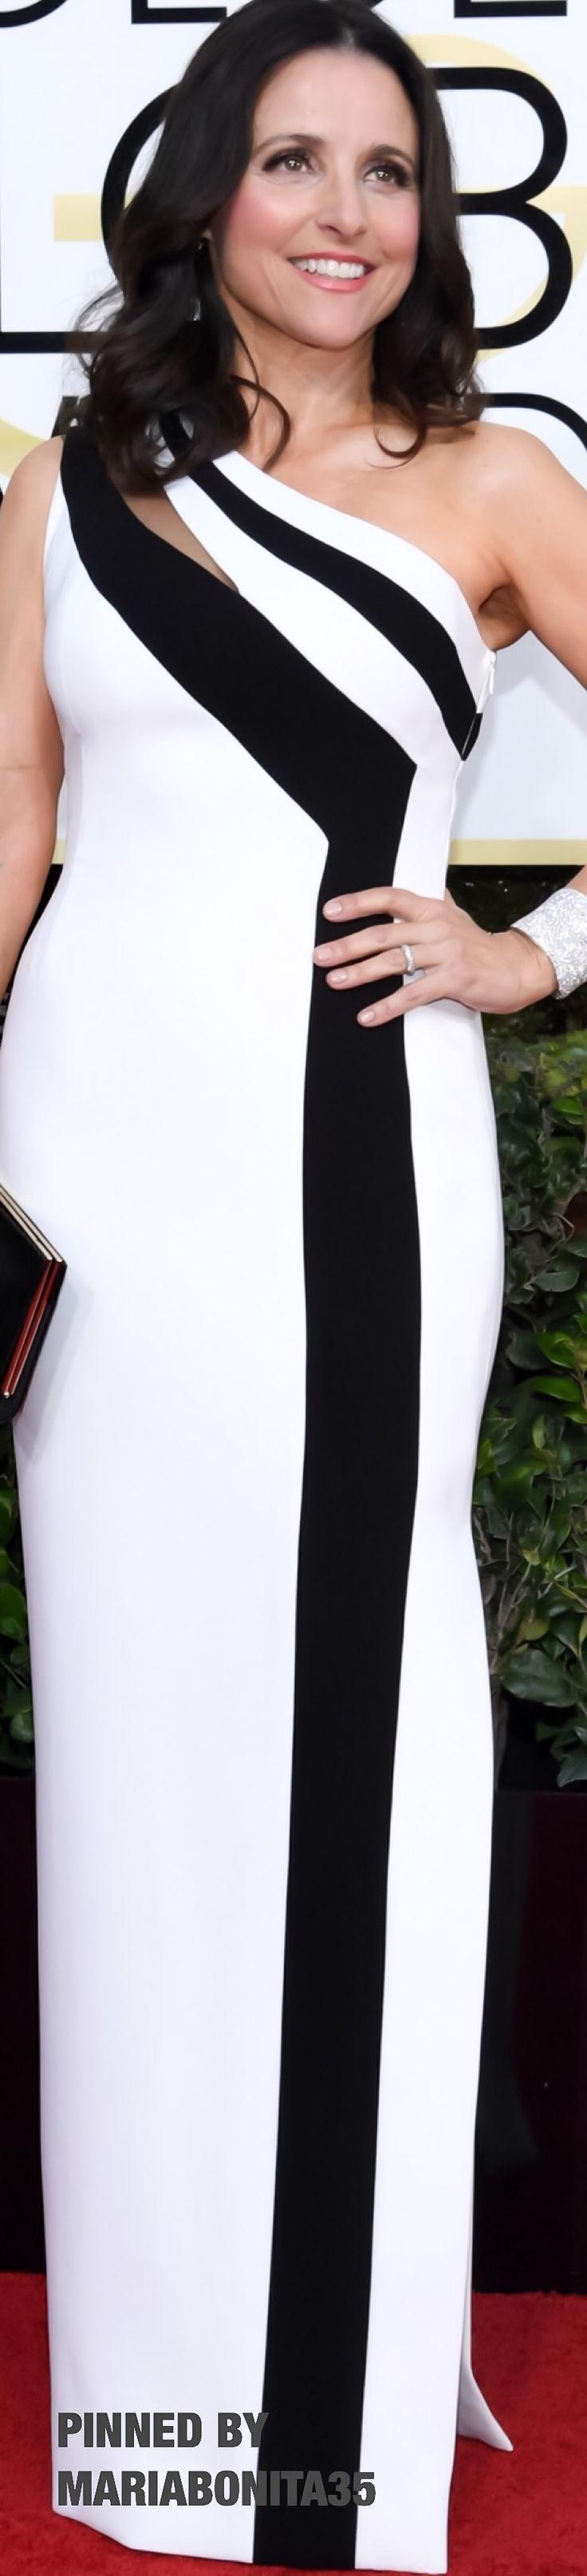 2017 Golden Globe Awards Red Carpet Arrivals  Julia Louis-Deyfrus wearing Georges Chakra